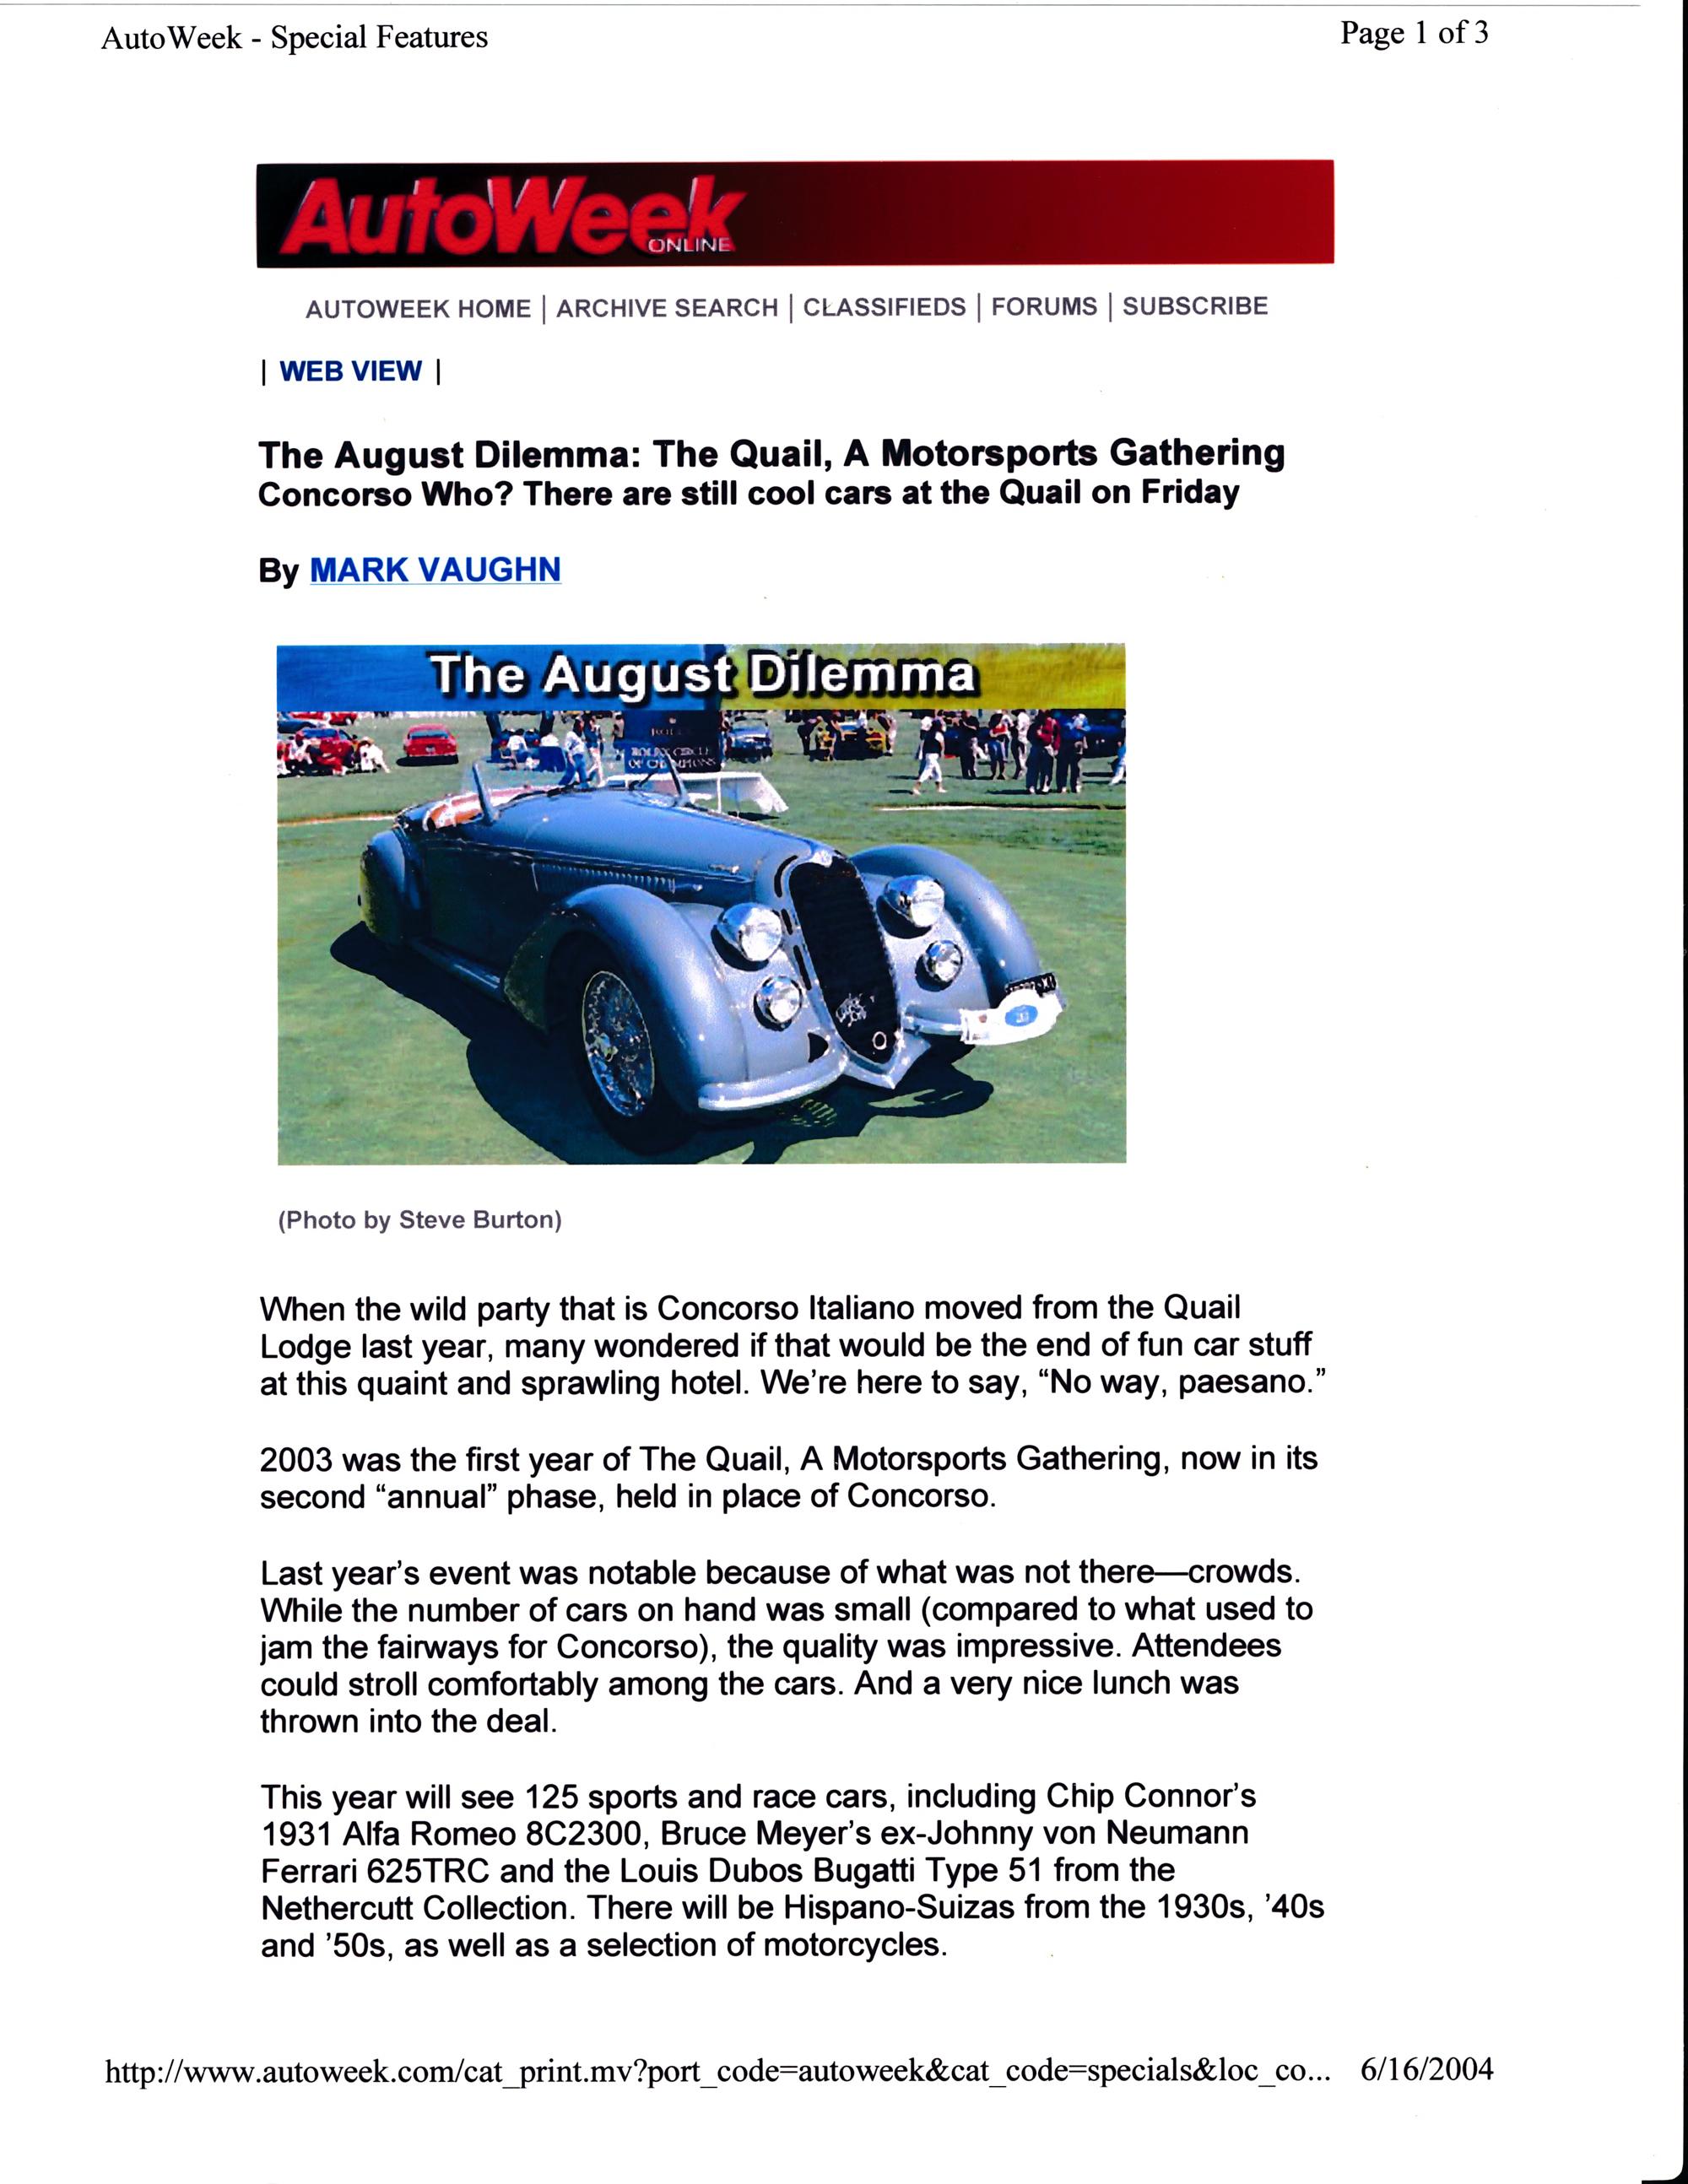 Quail Motorsports Gathering